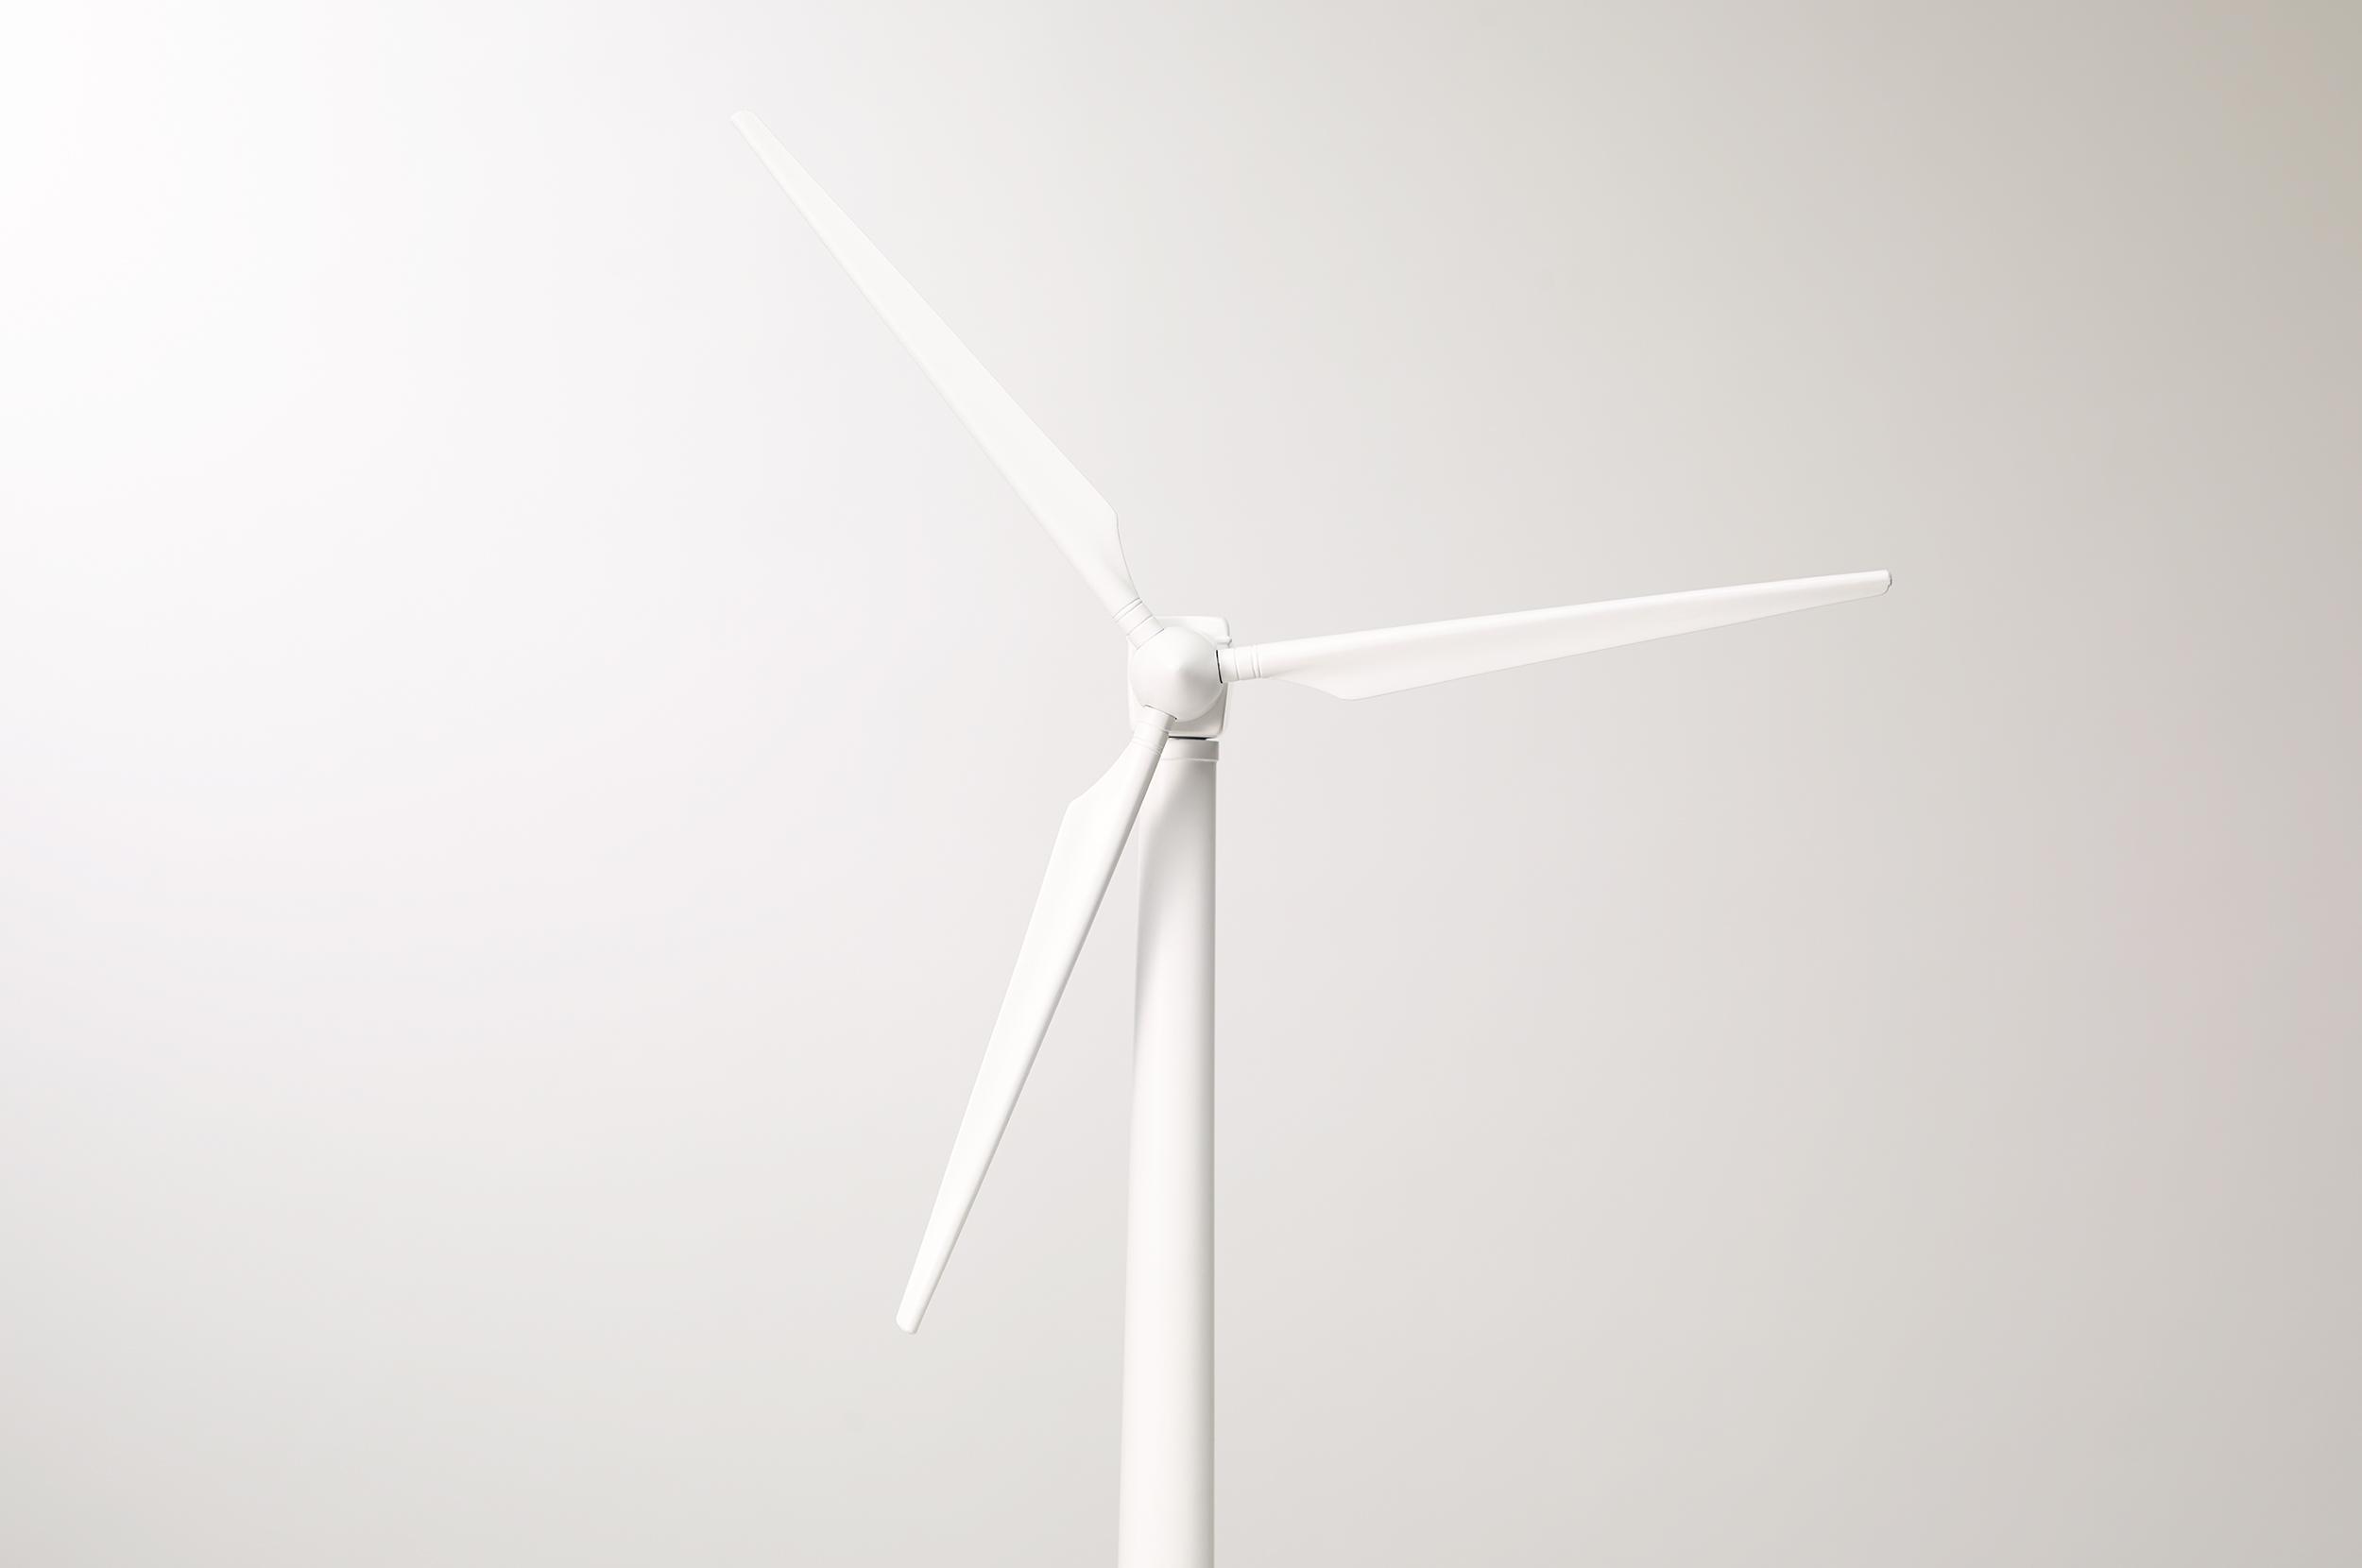 _170106 Post and Gleam table top Windmills Single COMP R1 FLLR.jpg